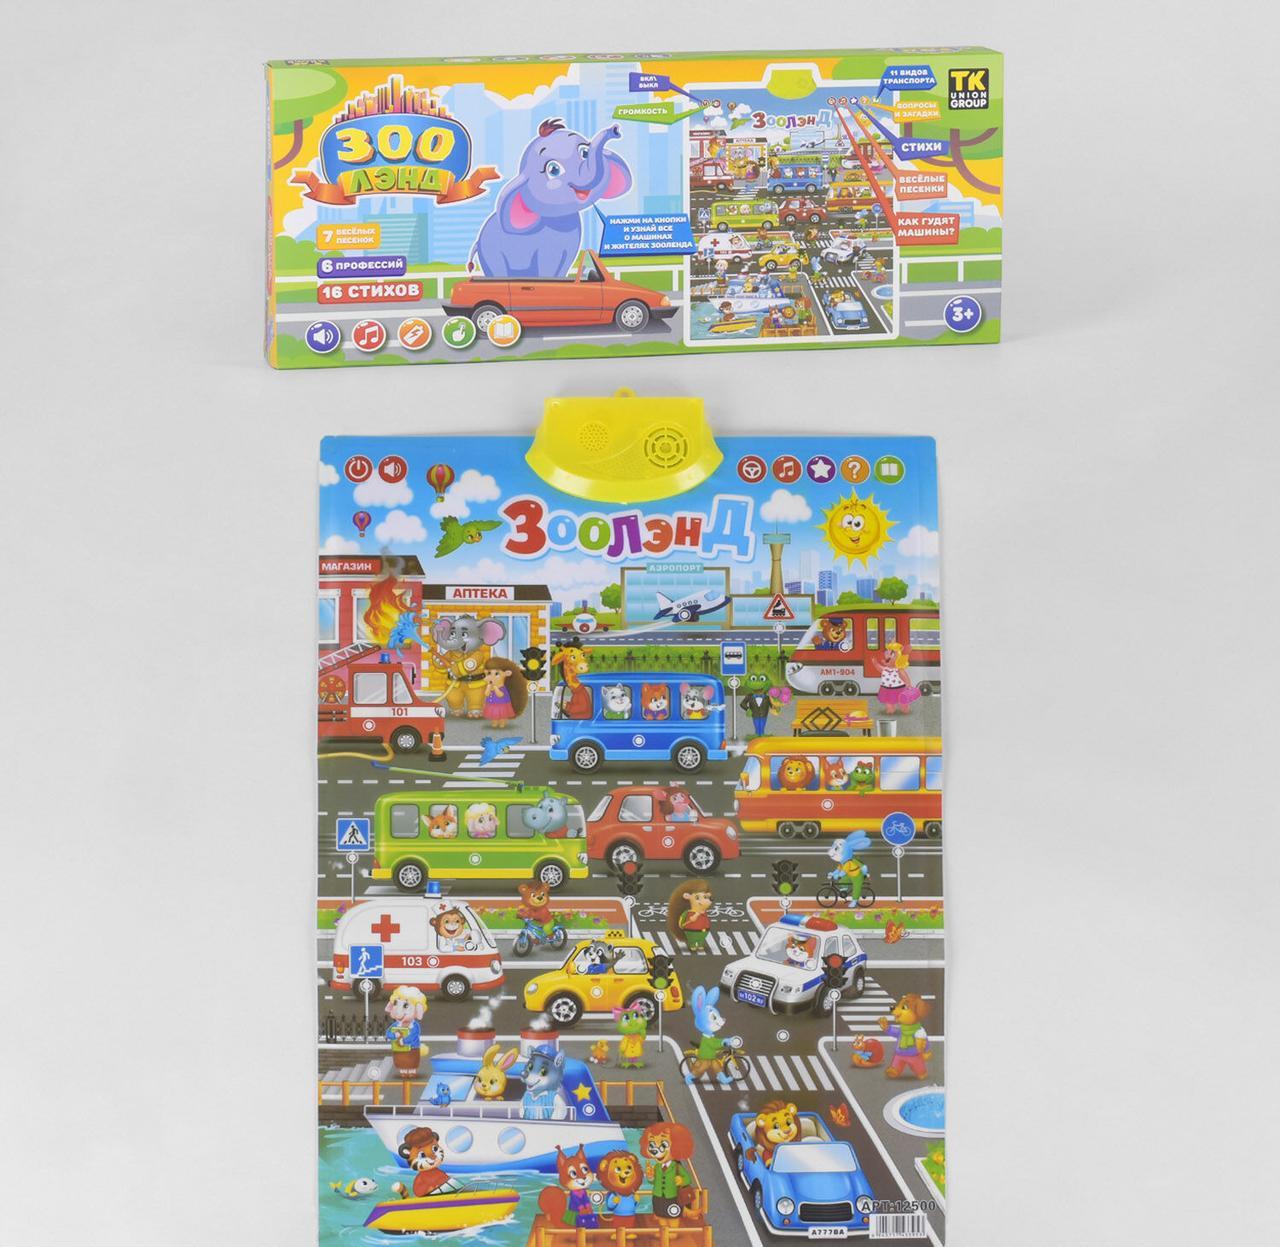 Плакат «Зоолэнд» TK GROUP, 16 стихов, 7 песенок, загадки, русское озвучивание, на батарейках, в коробке 12500